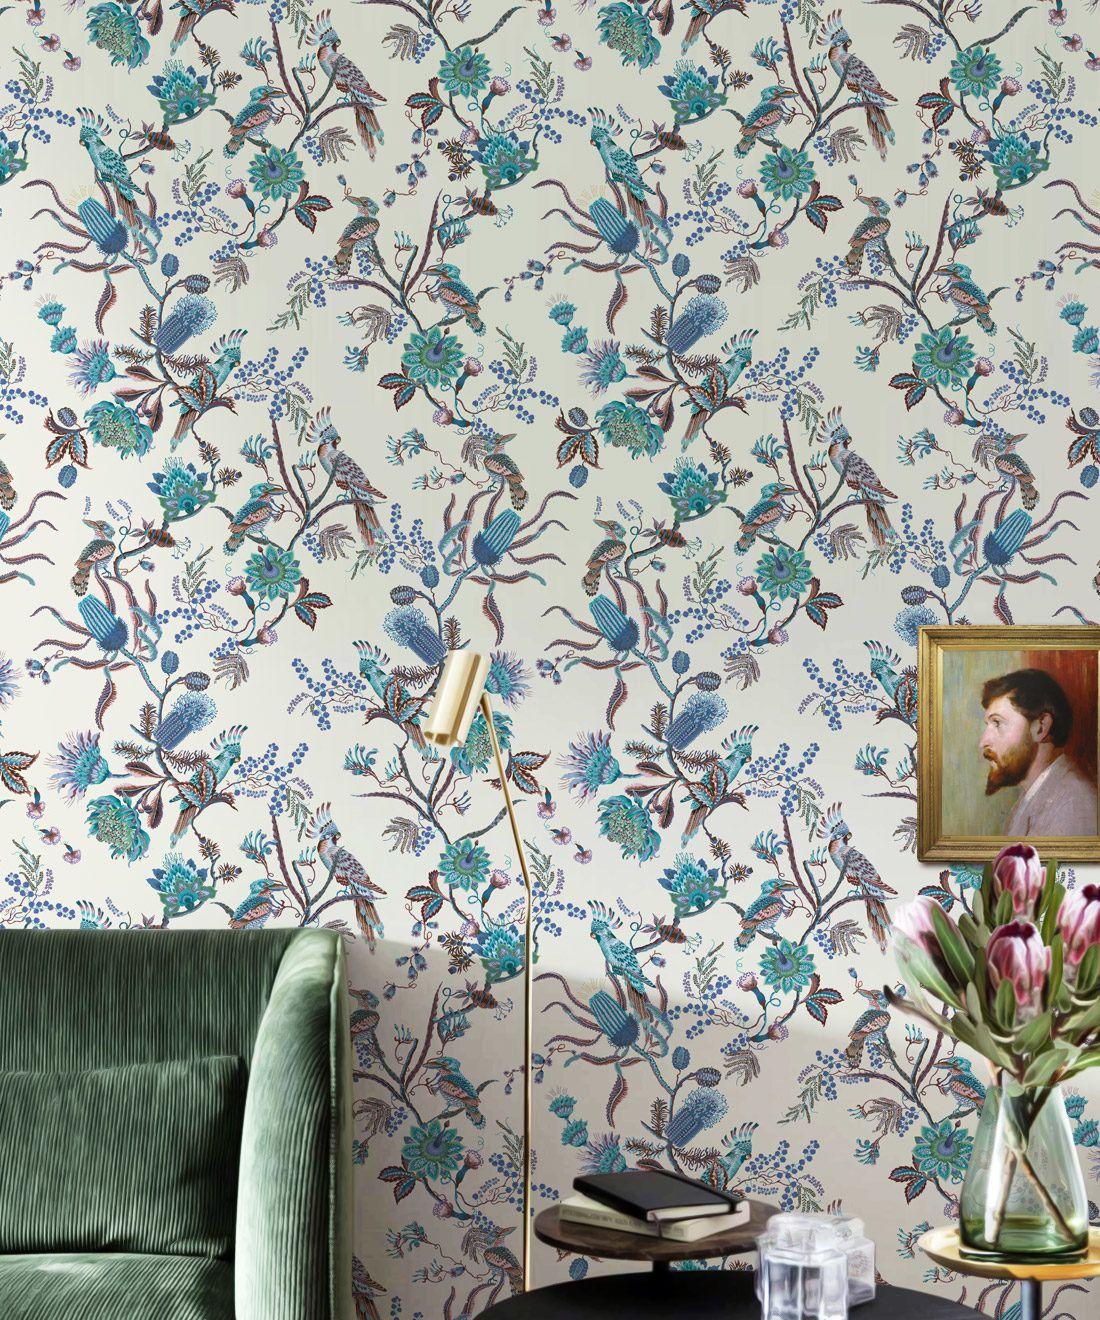 Matilda Wallpaper • Cockatoo, kookaburra • Australian Wallpaper • Milton & King USA • Blue Bell Insitu